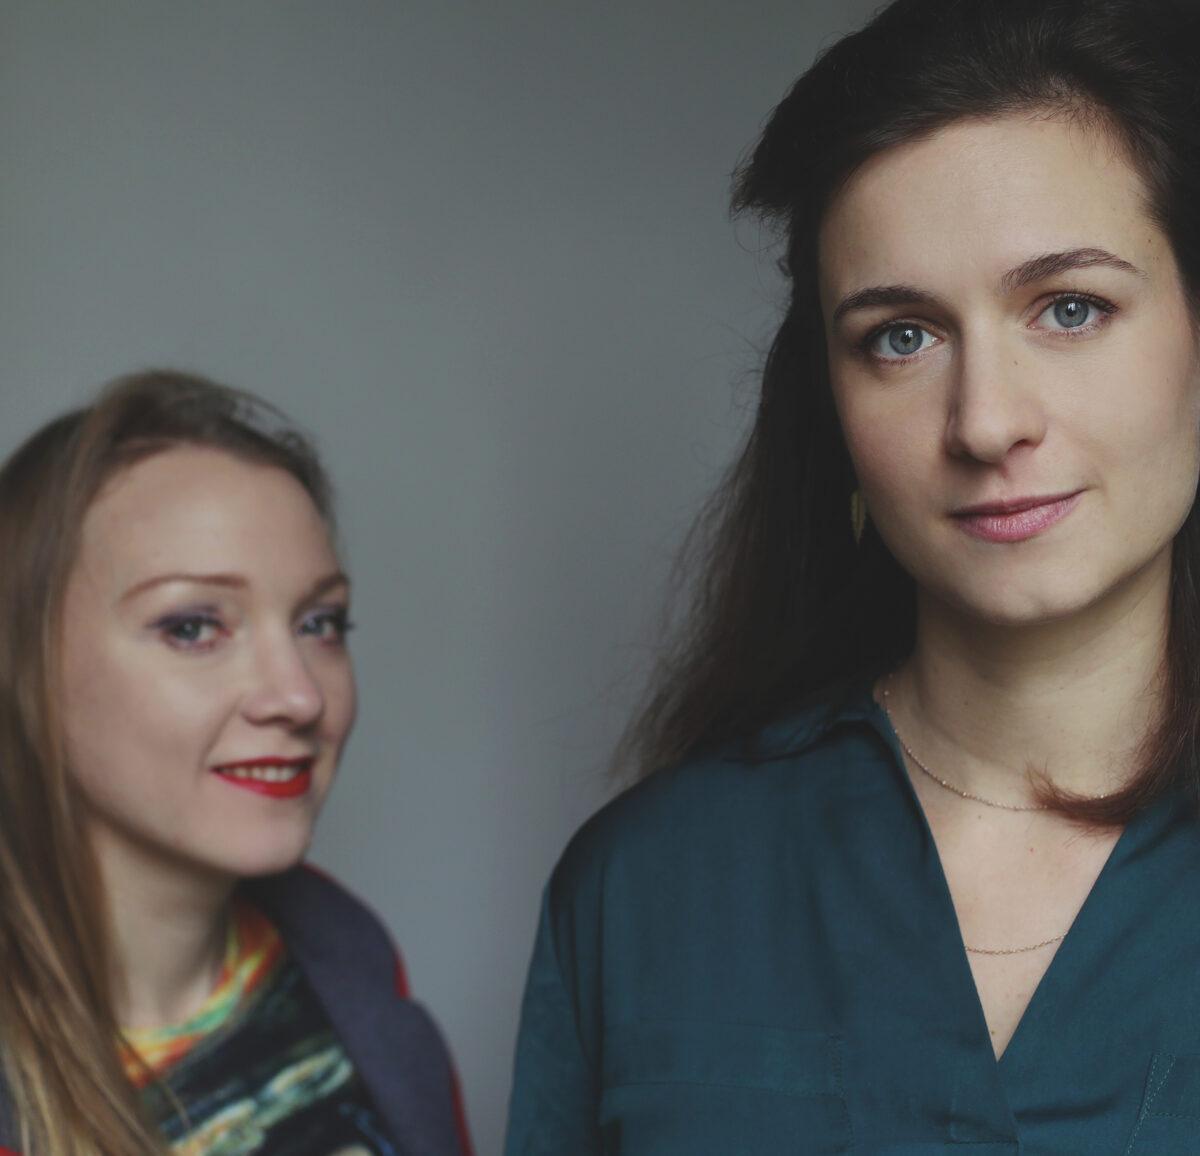 Anna Besson & Olga Pashchenko - Variations ©Lisa Lesourd